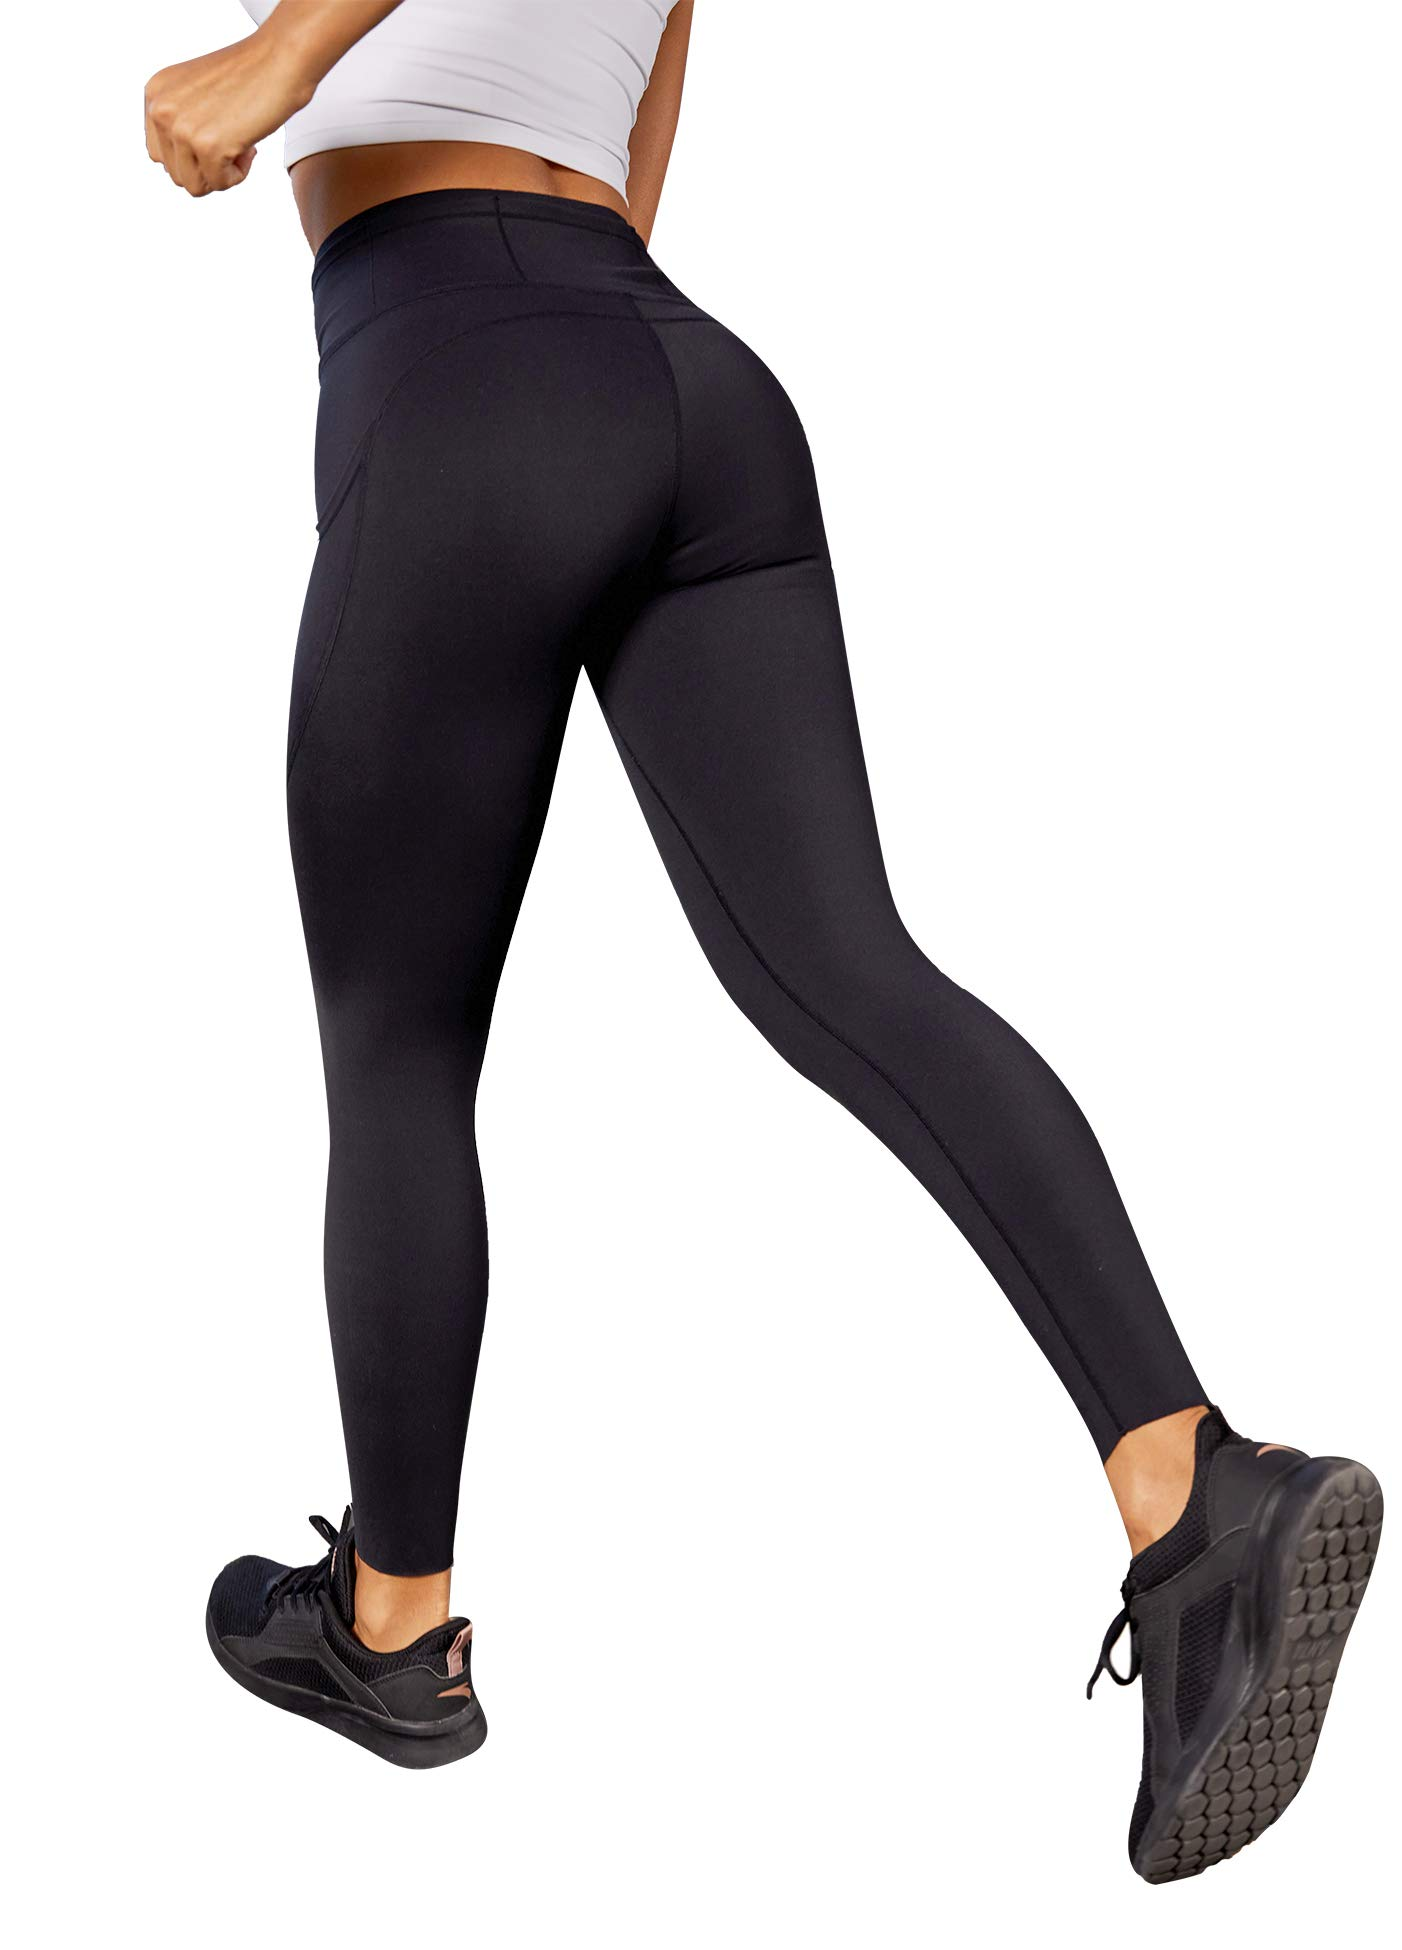 BATHRINS High Waist Yoga Pants with 7 Pockets for Women 4 Way